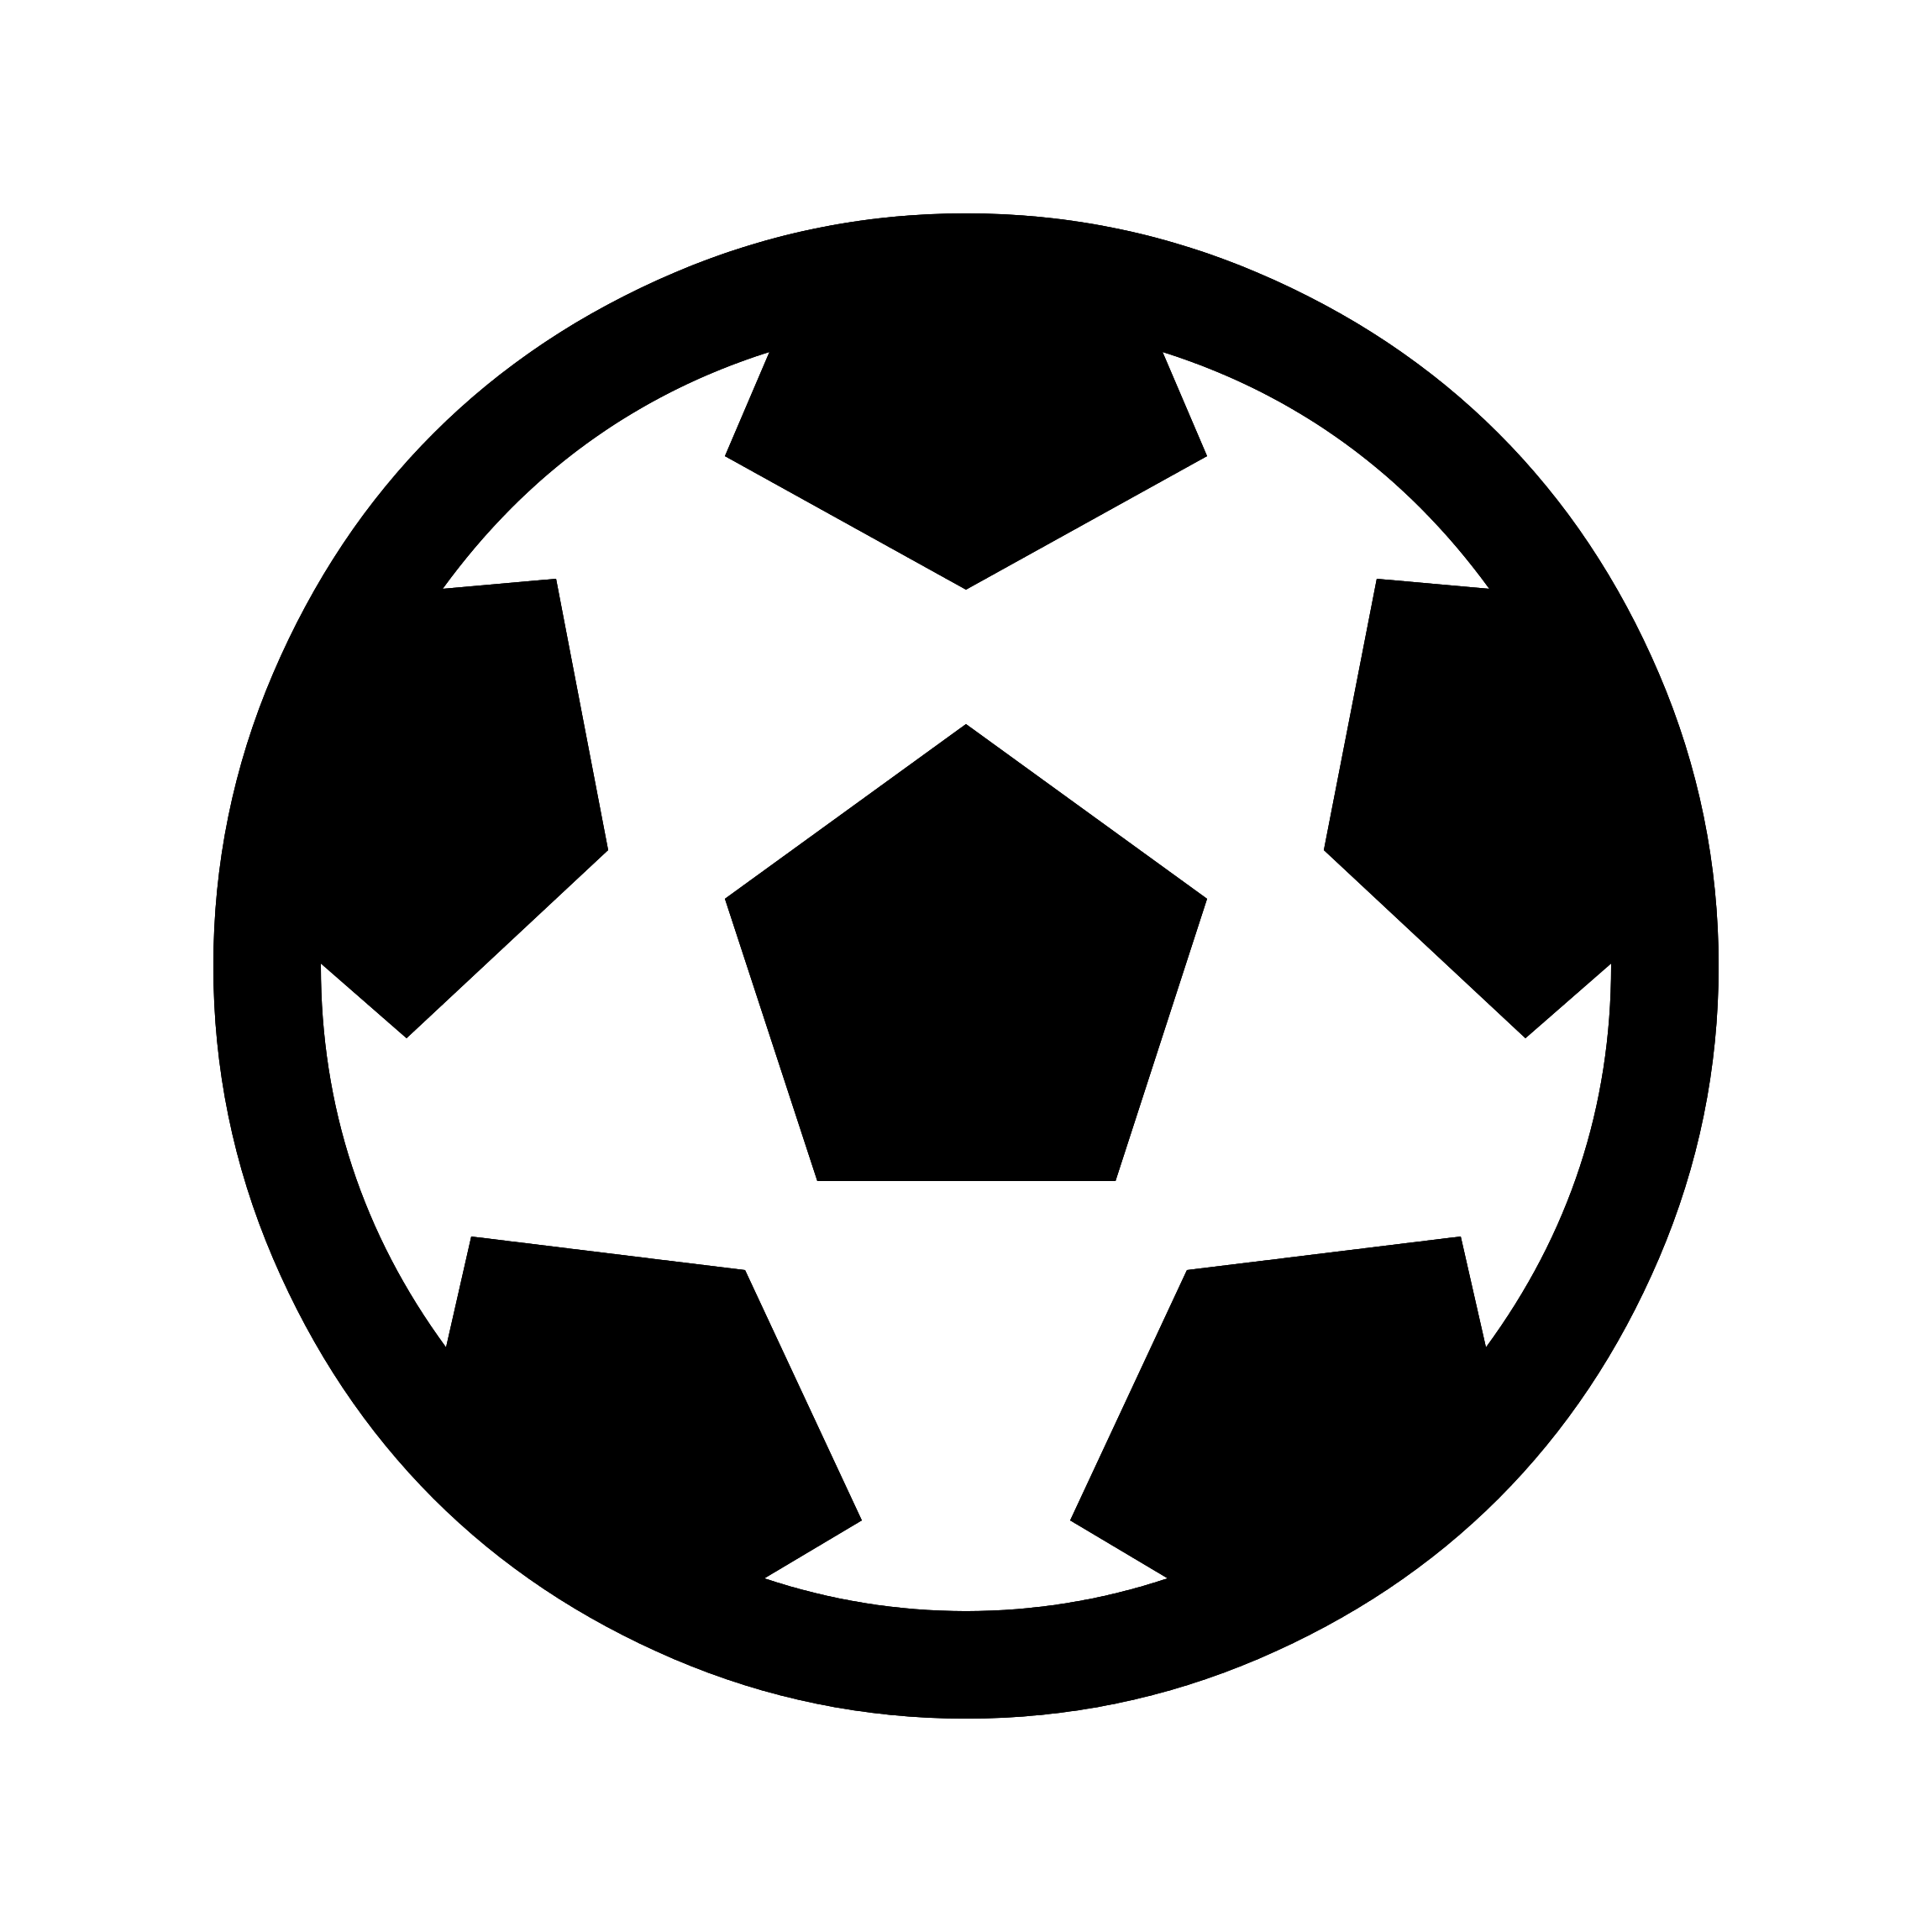 data/images/futbol-o.png